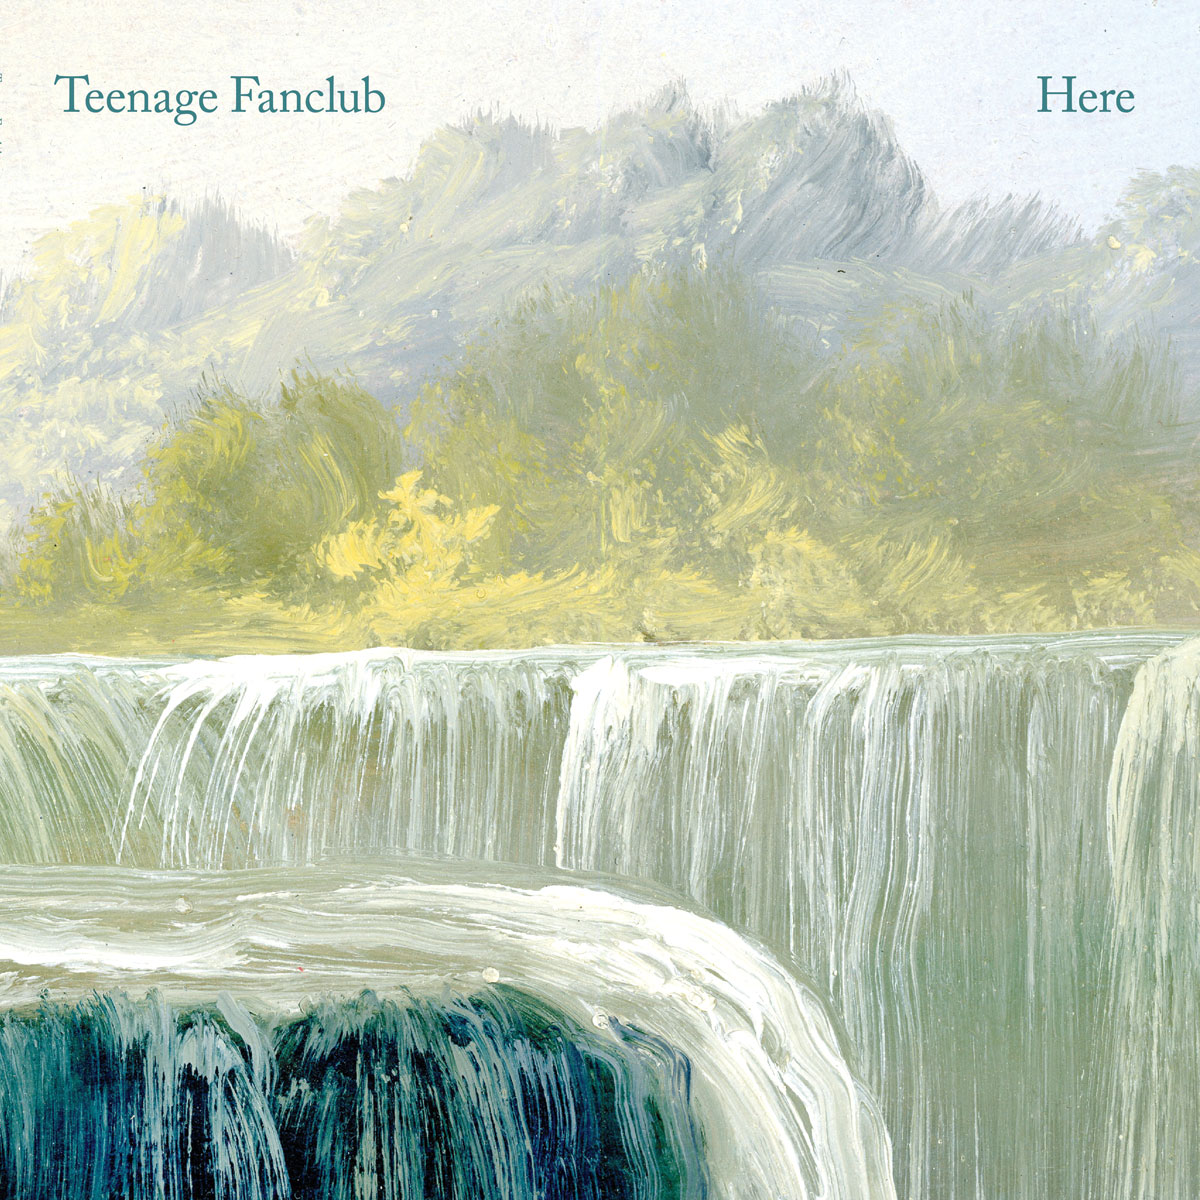 Teenage Fanclub - Here